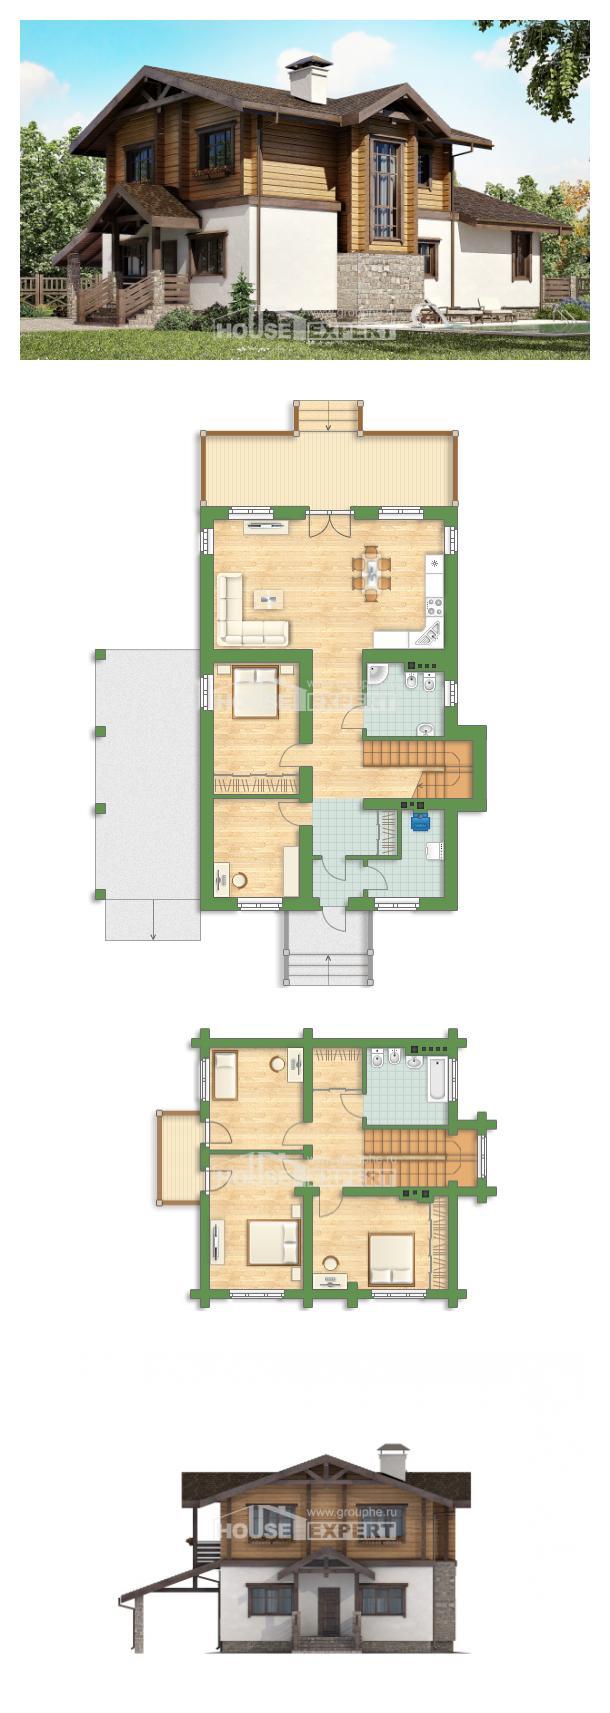 Проект дома 170-004-Л | House Expert